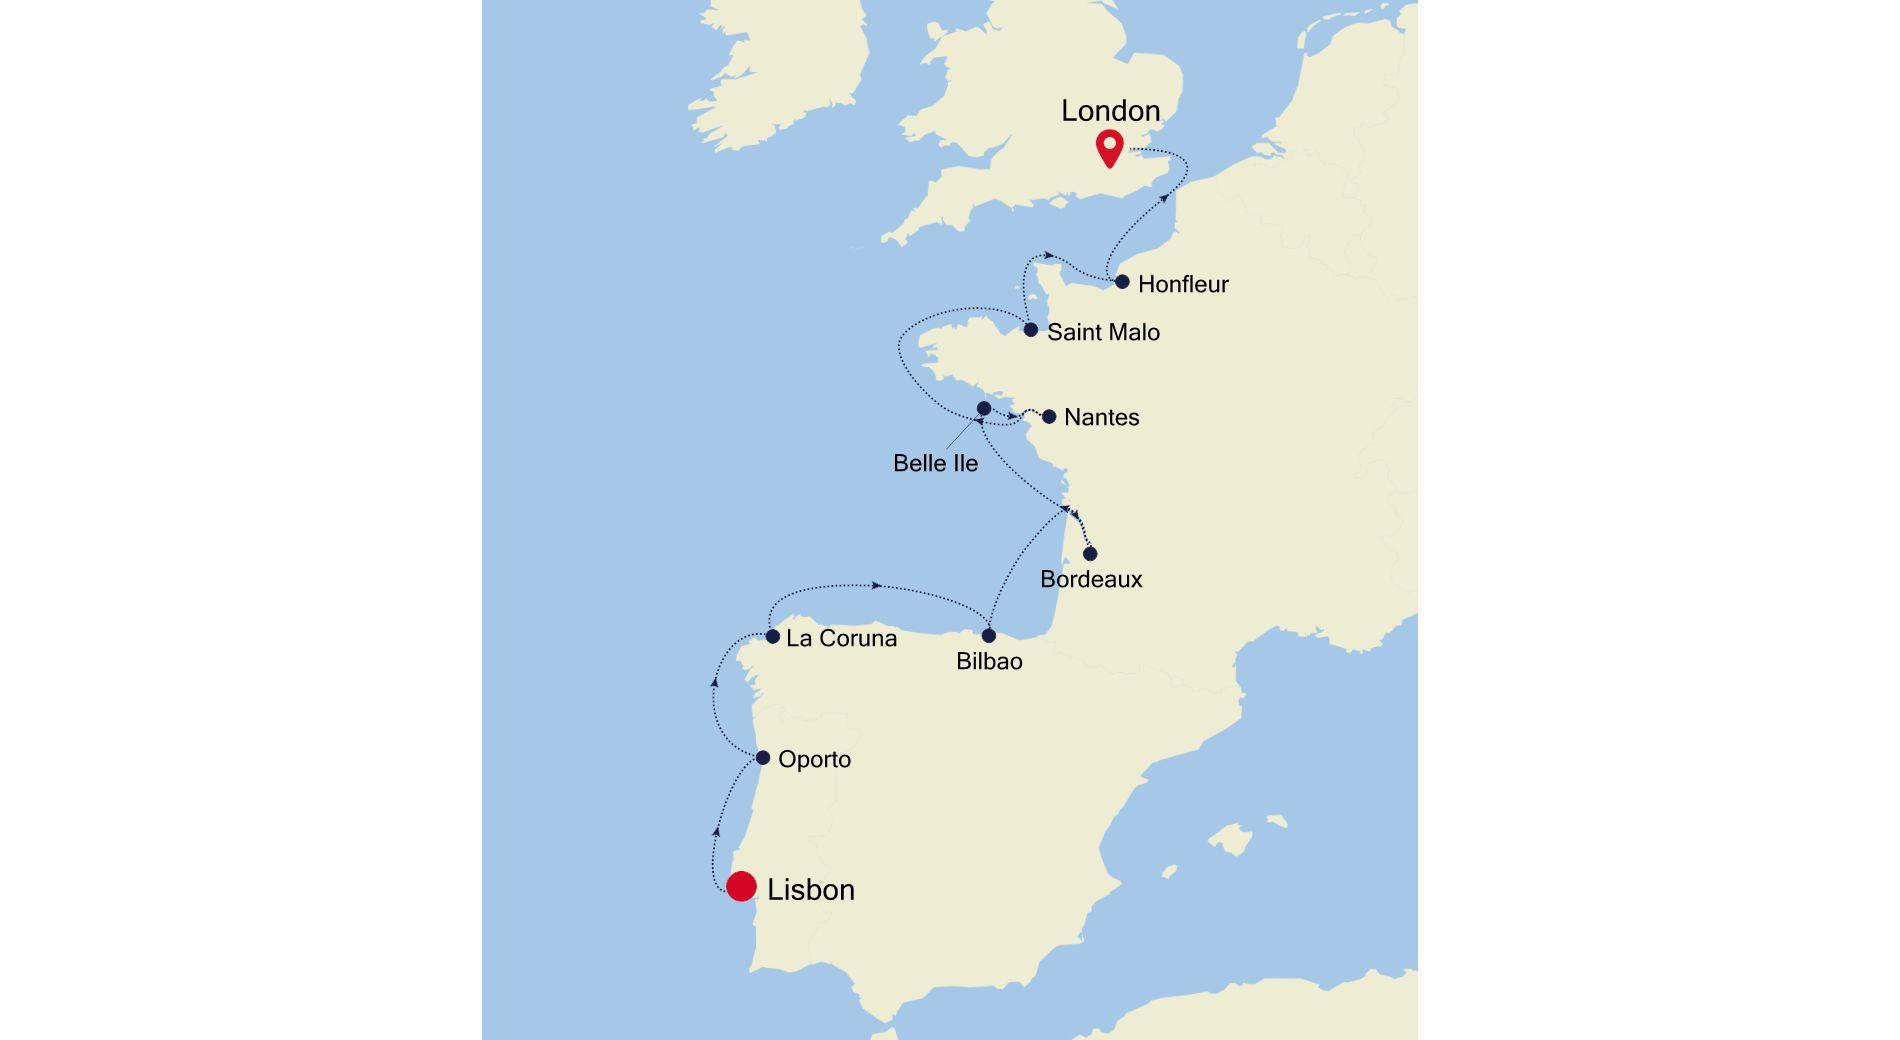 E4200507012 - Lisbon to London